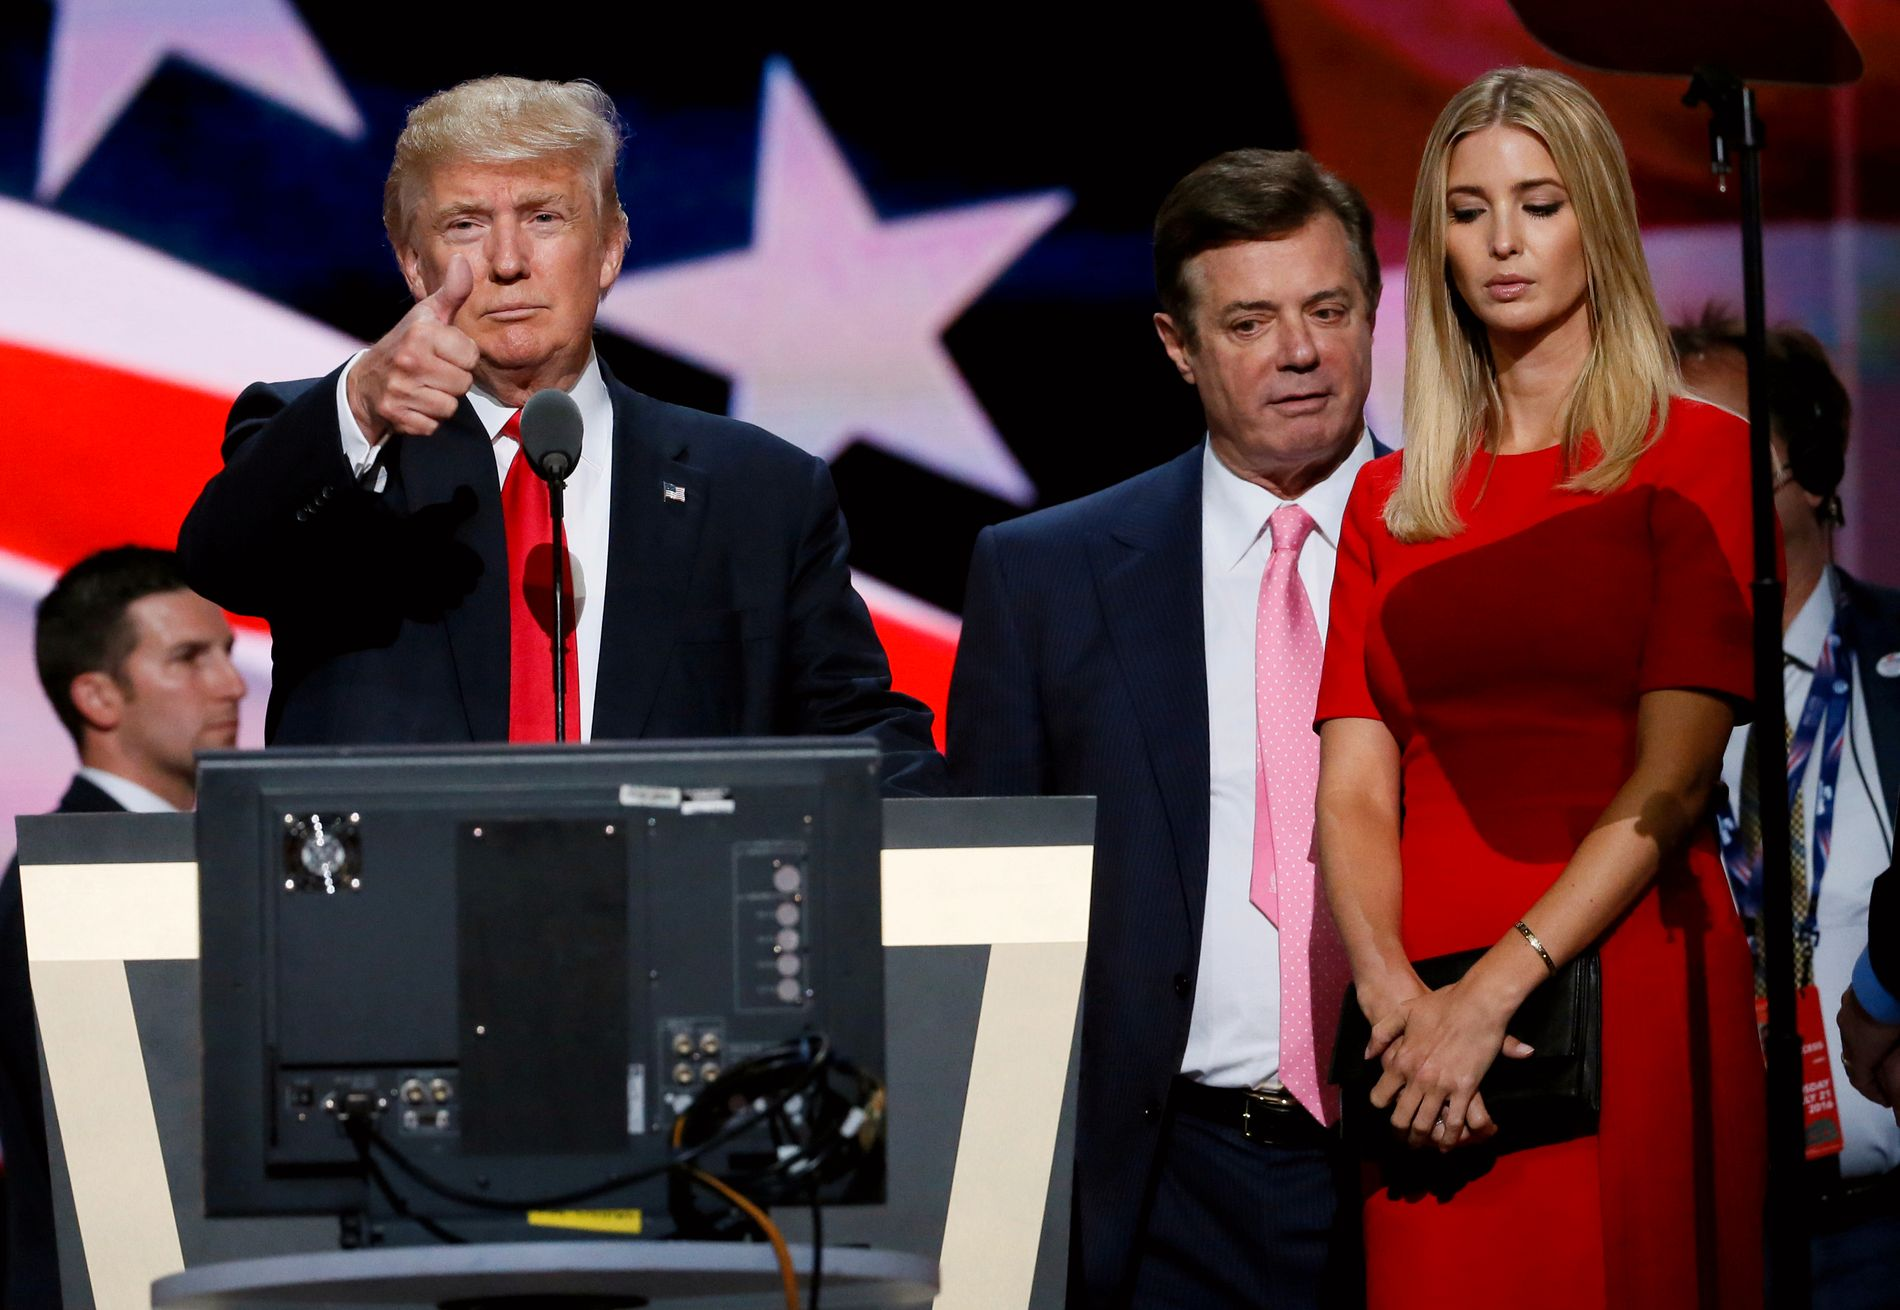 DEN INNERSTE SIRKEL: President Donald Trump, hans tidligere kampanjesjef Paul Manafor (i midten) og hans datter Ivanka under Det republikanske partietslandsmøtet i 2016.